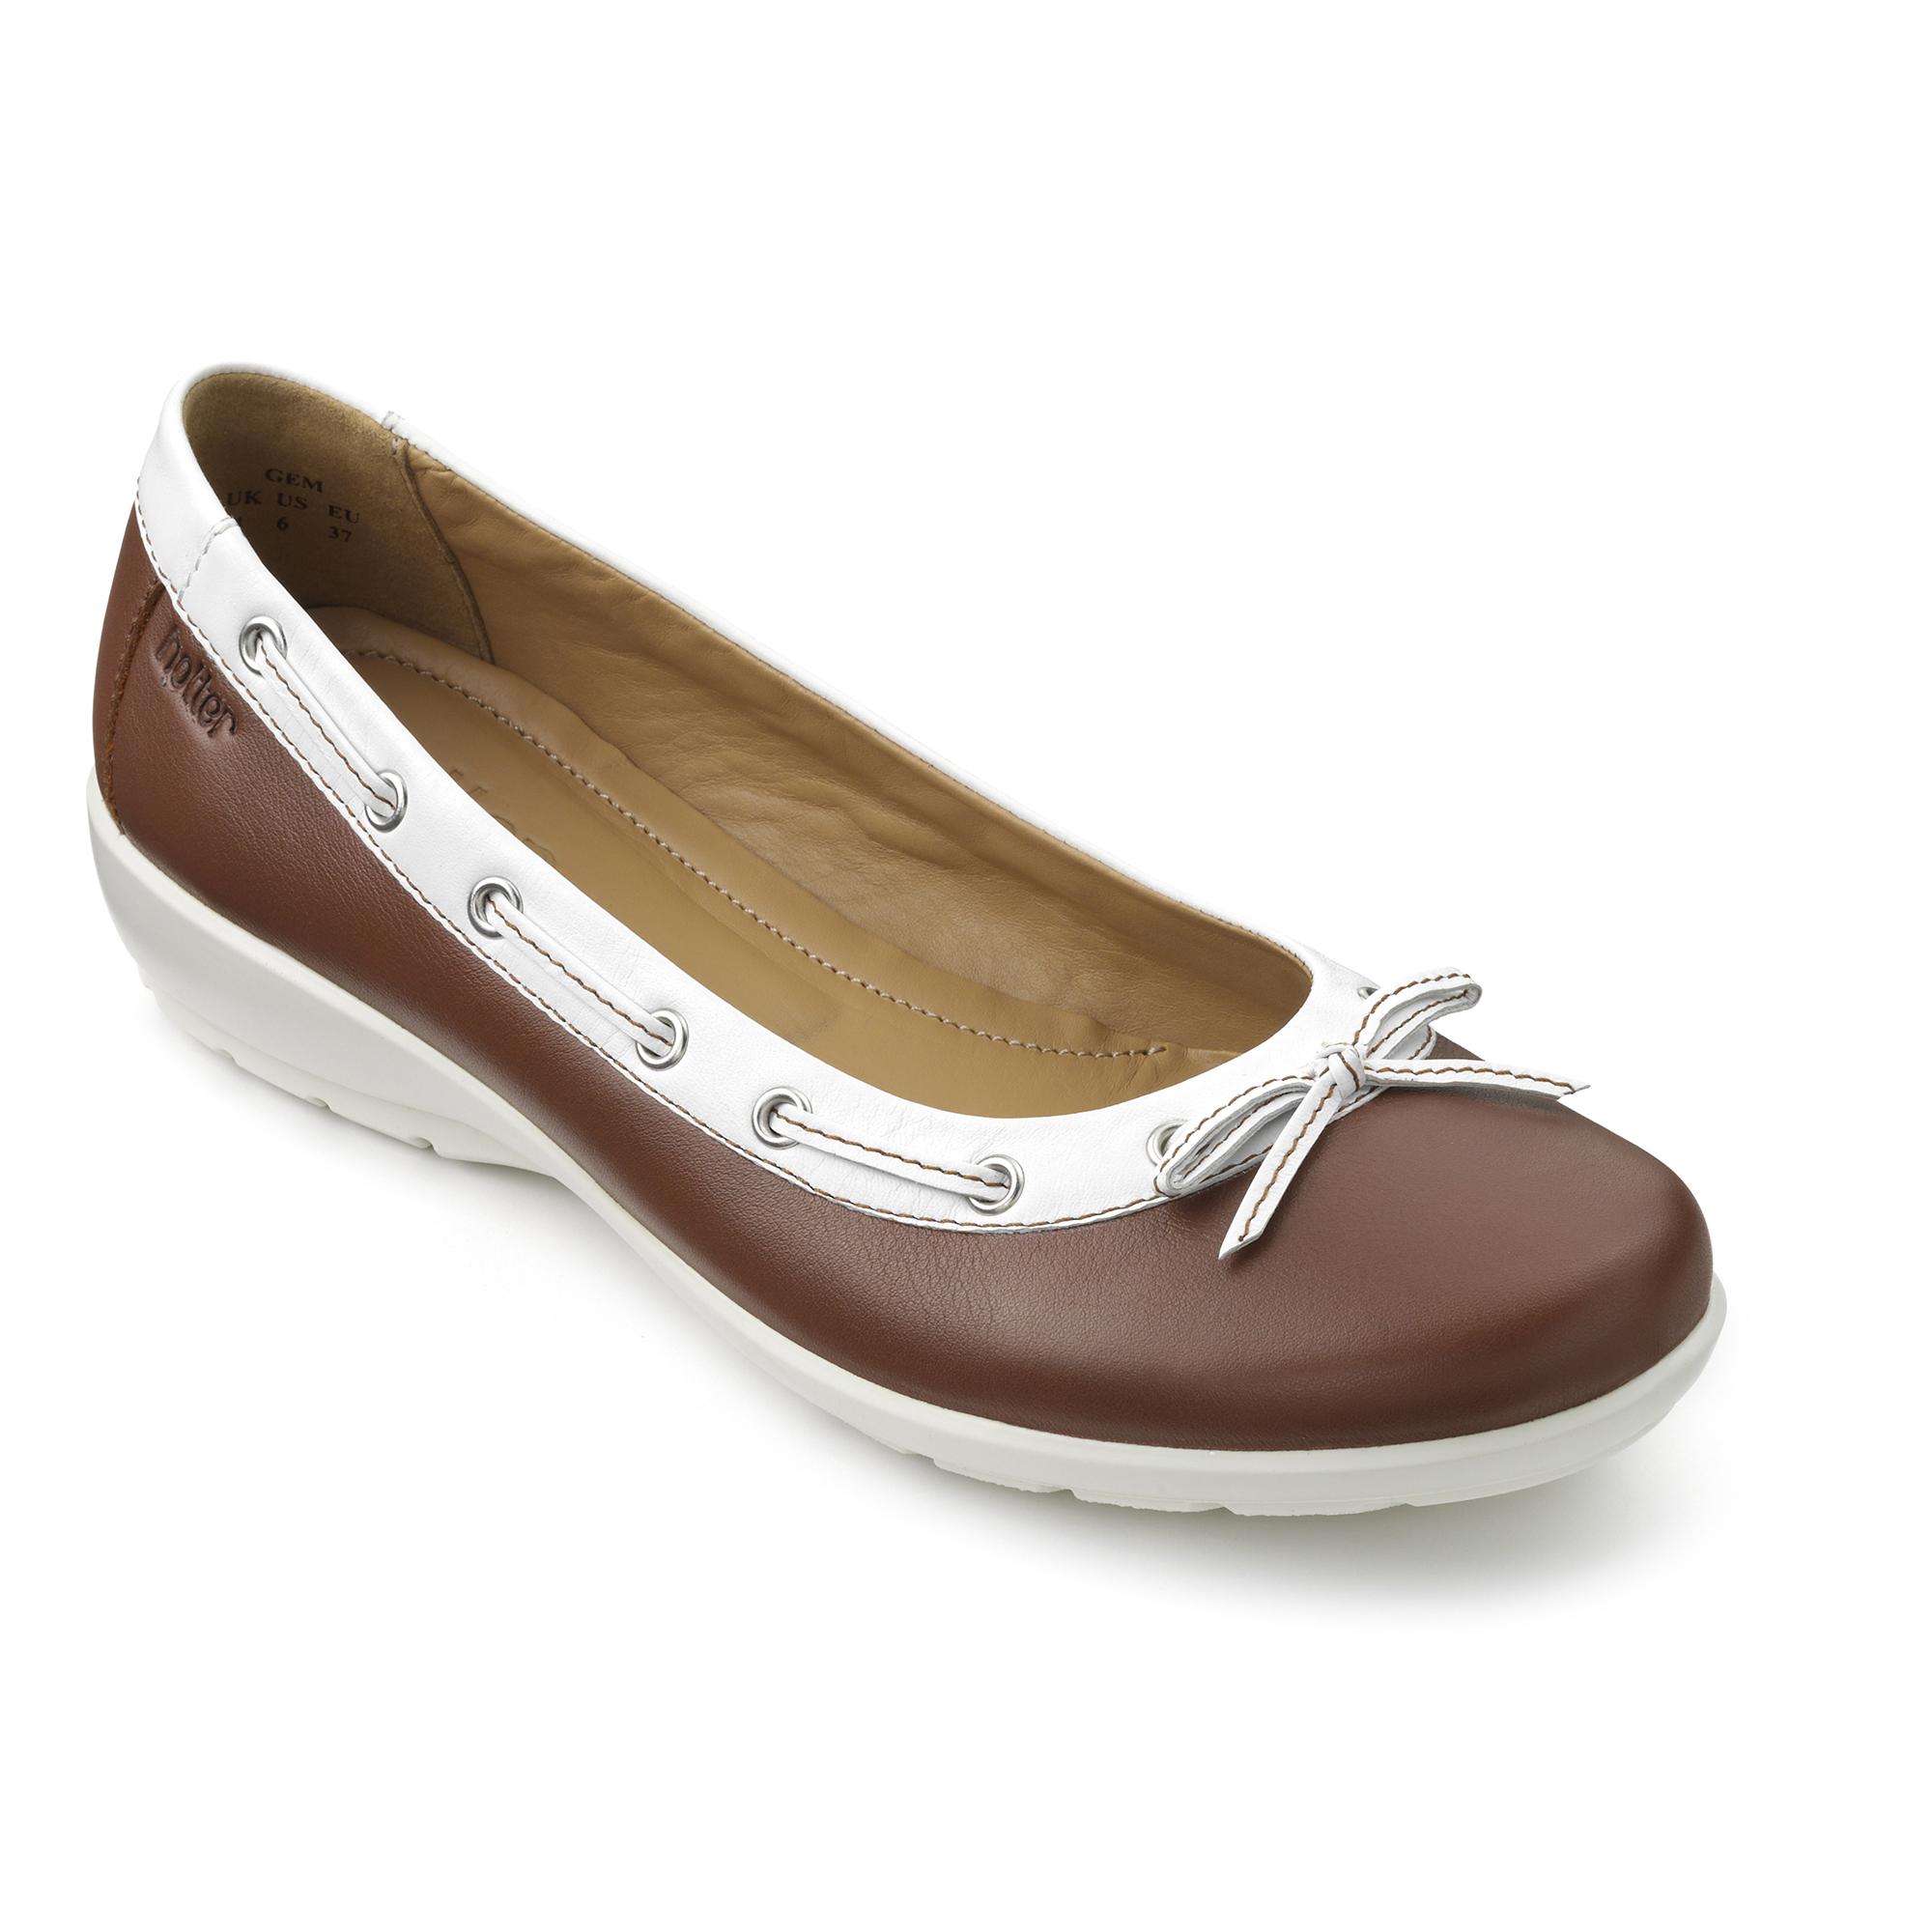 Hotter-Mujer-Gem-Senoras-Bailarina-Estilo-Zapatos-Calzado-Zapatillas-Casual